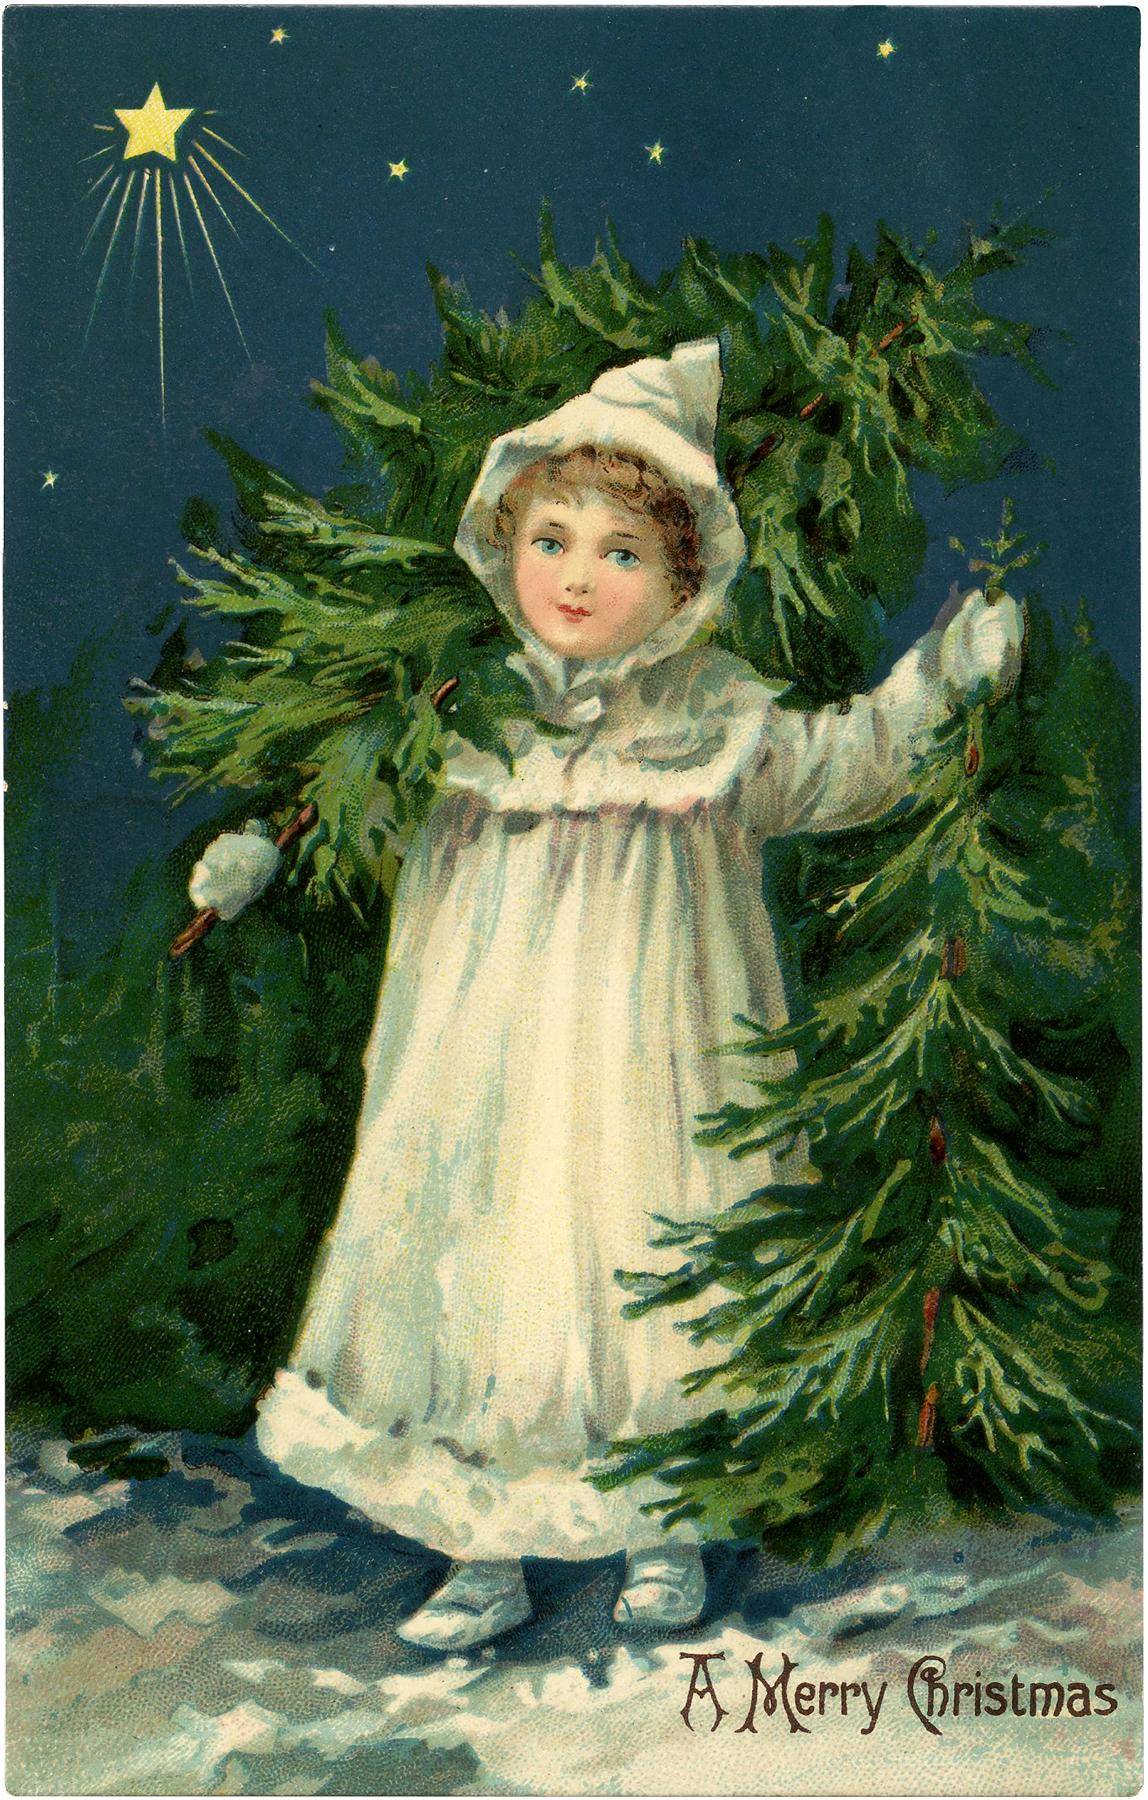 Christmas Tree Farm Girl Image - Precious! - The Graphics ...